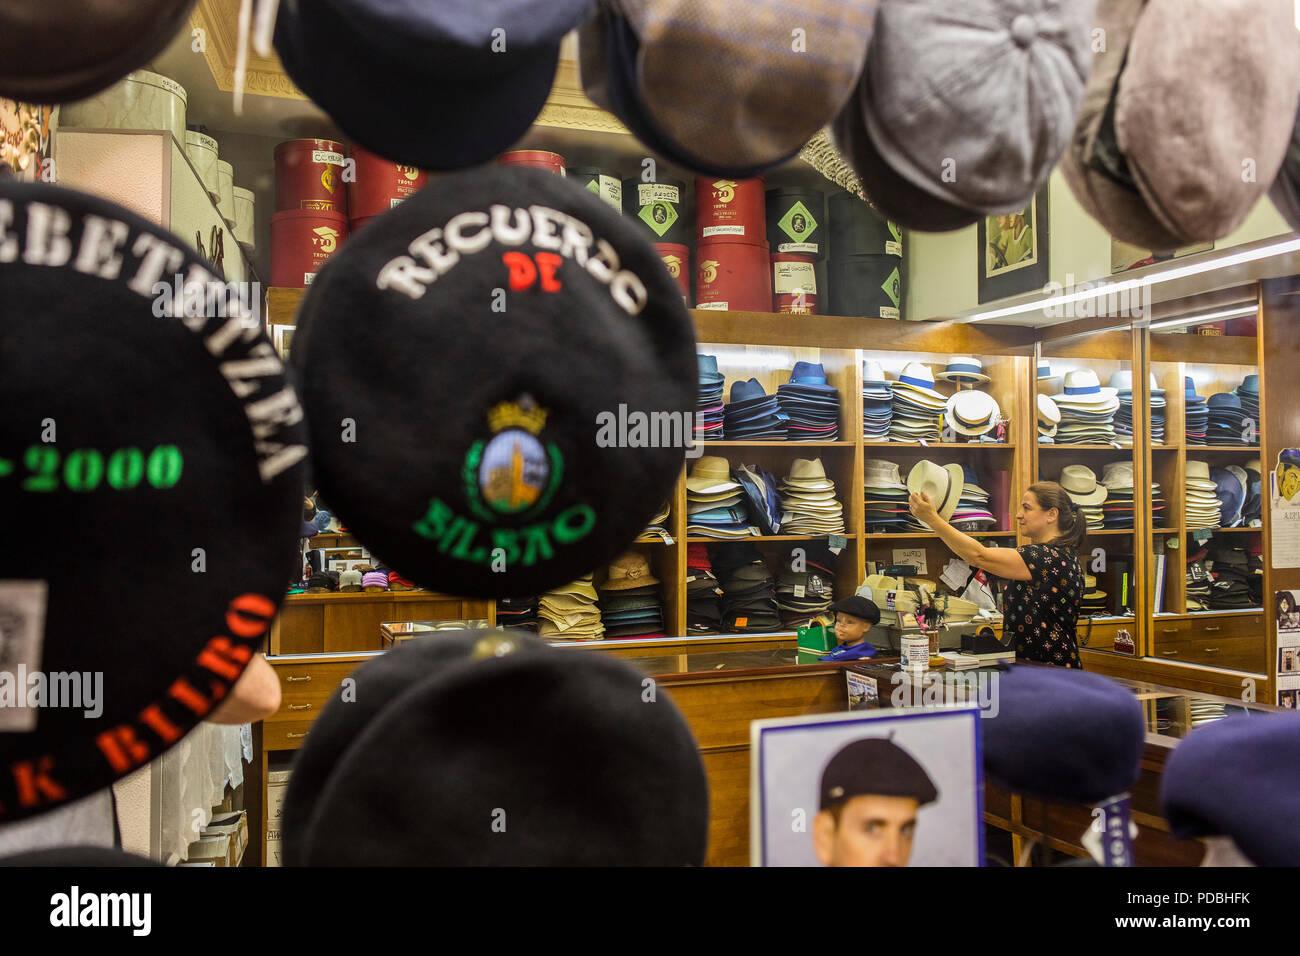 Hat shop, Sombreros Gorostiaga, 9 Viktor street, Old Town (Casco Viejo), Bilbao, Spain - Stock Image